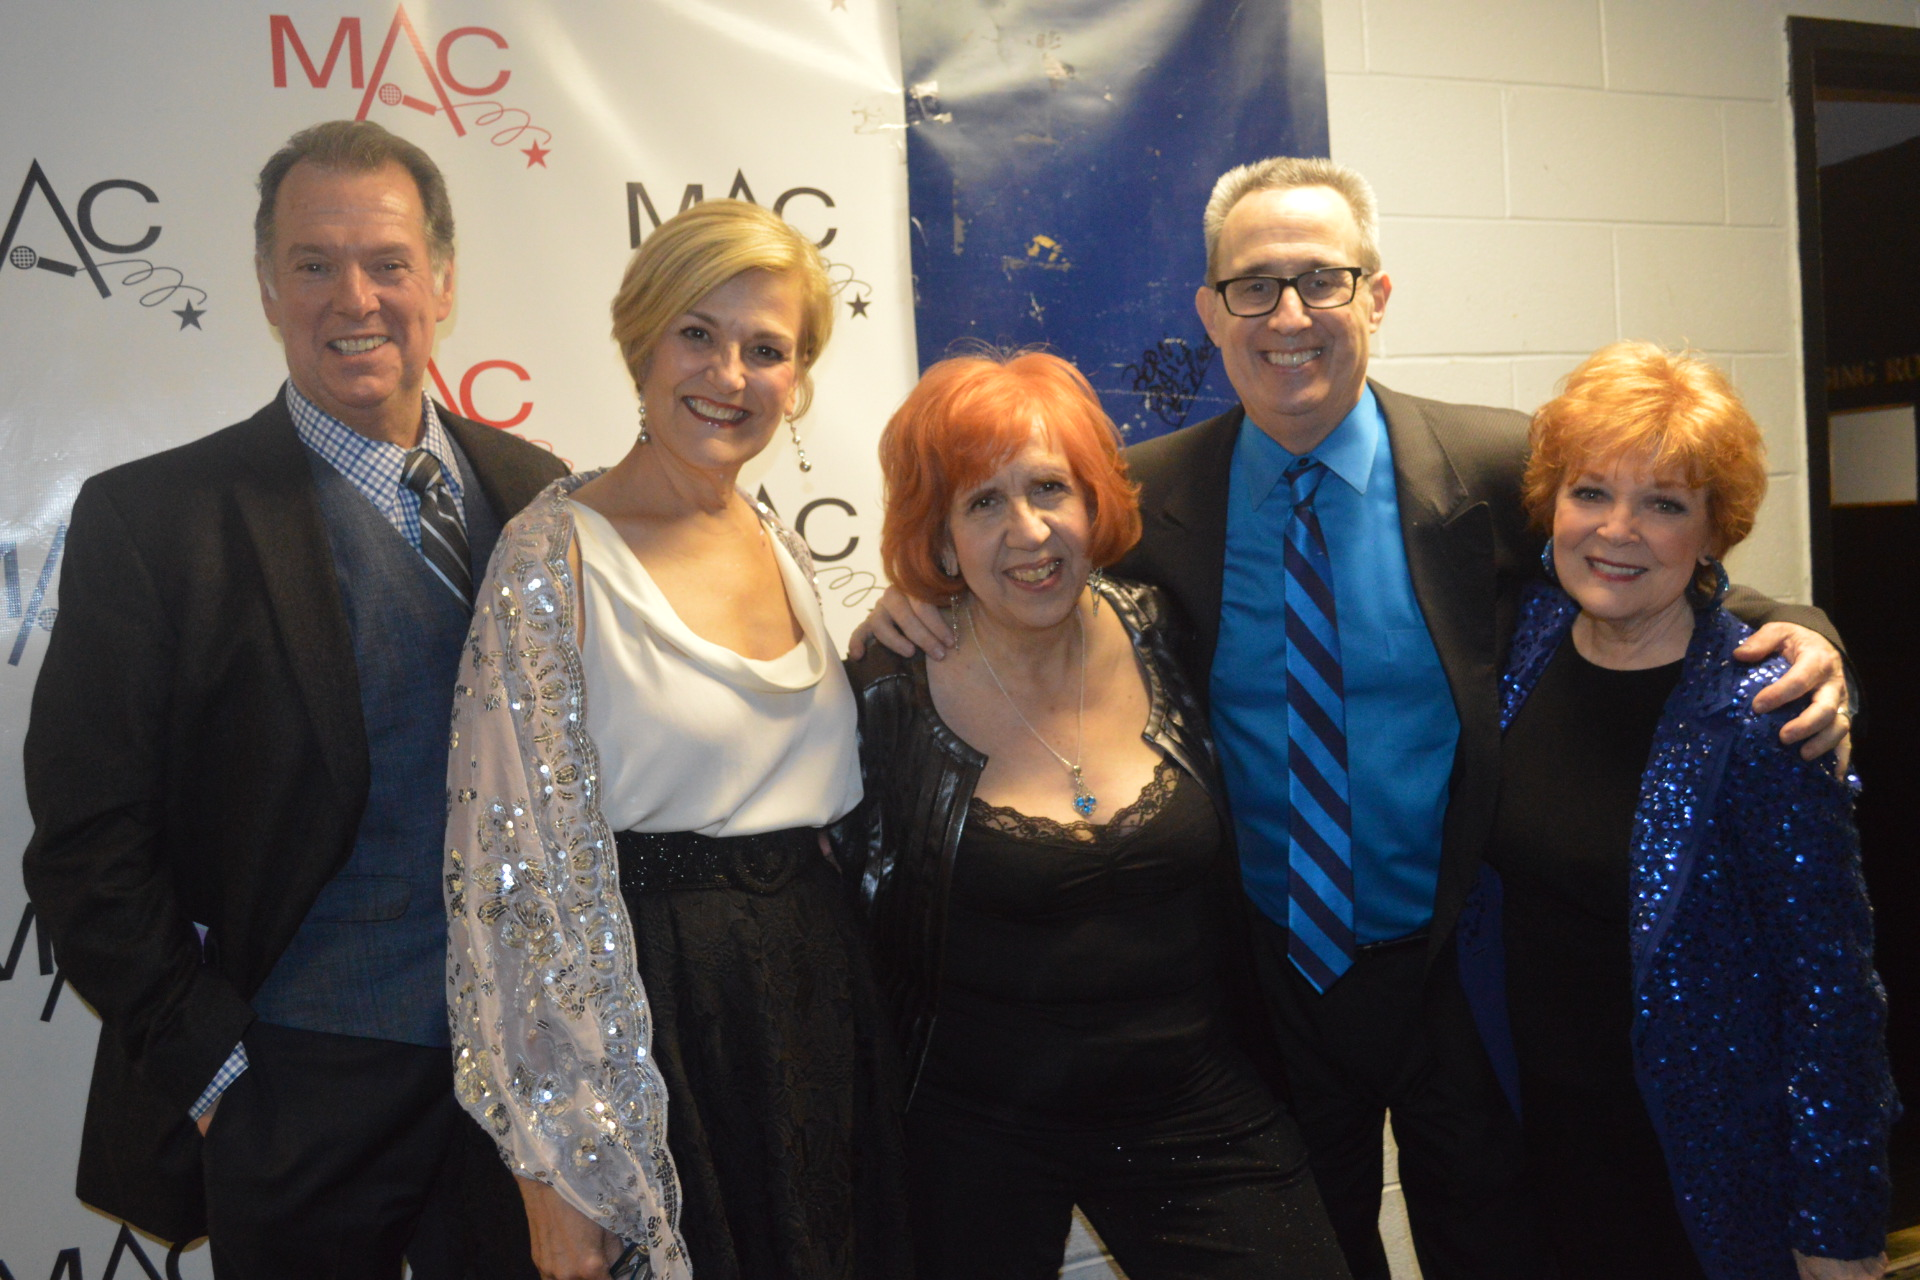 30th Annual MAC Awards RoundUp